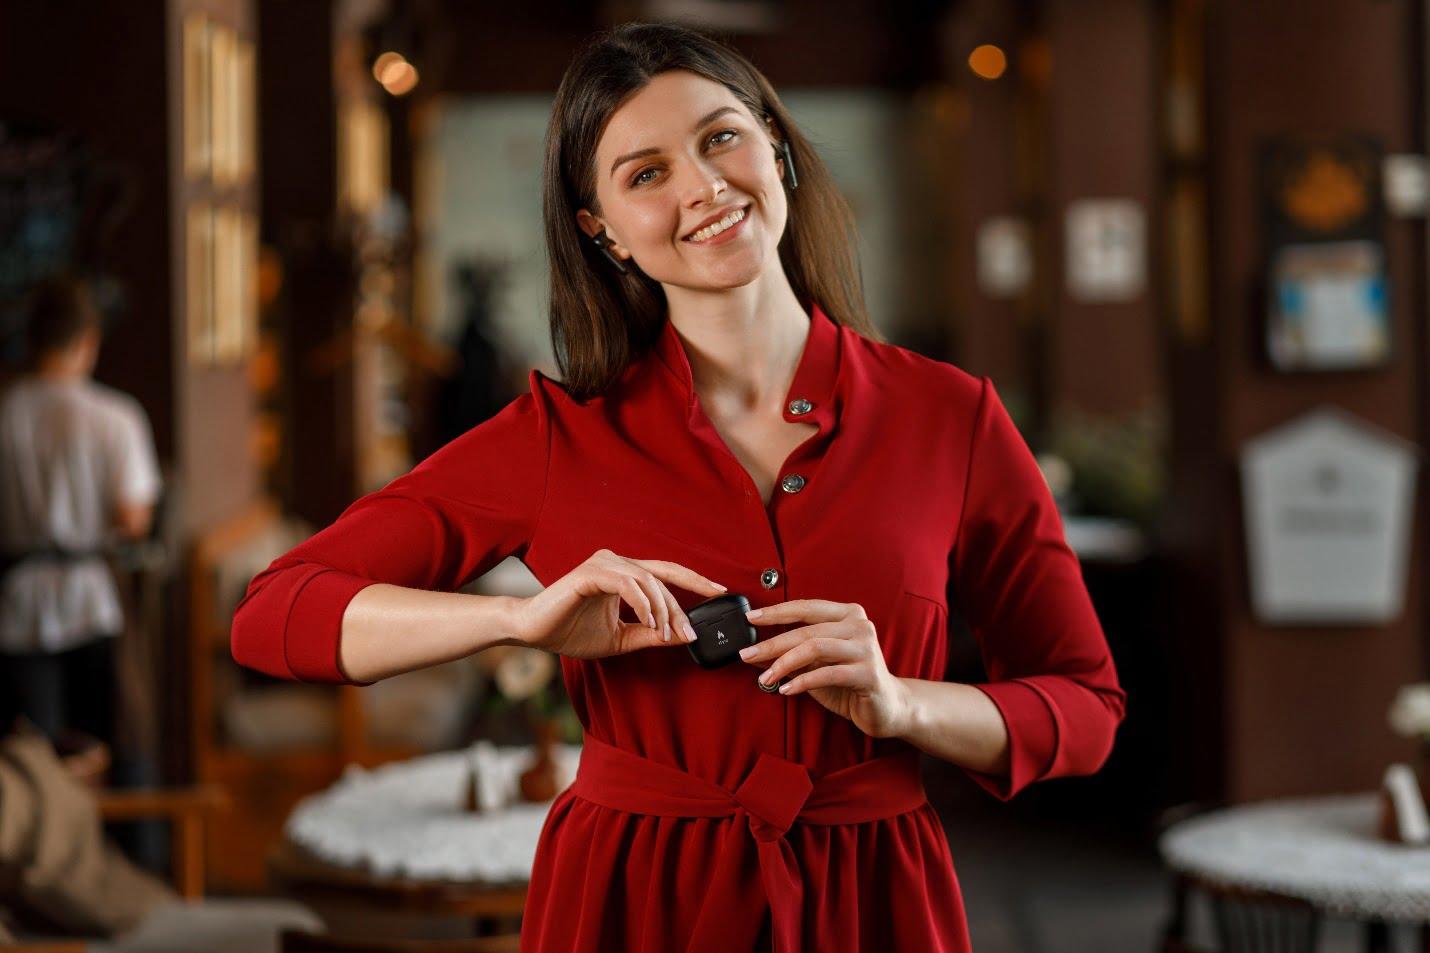 A girl holding earphones